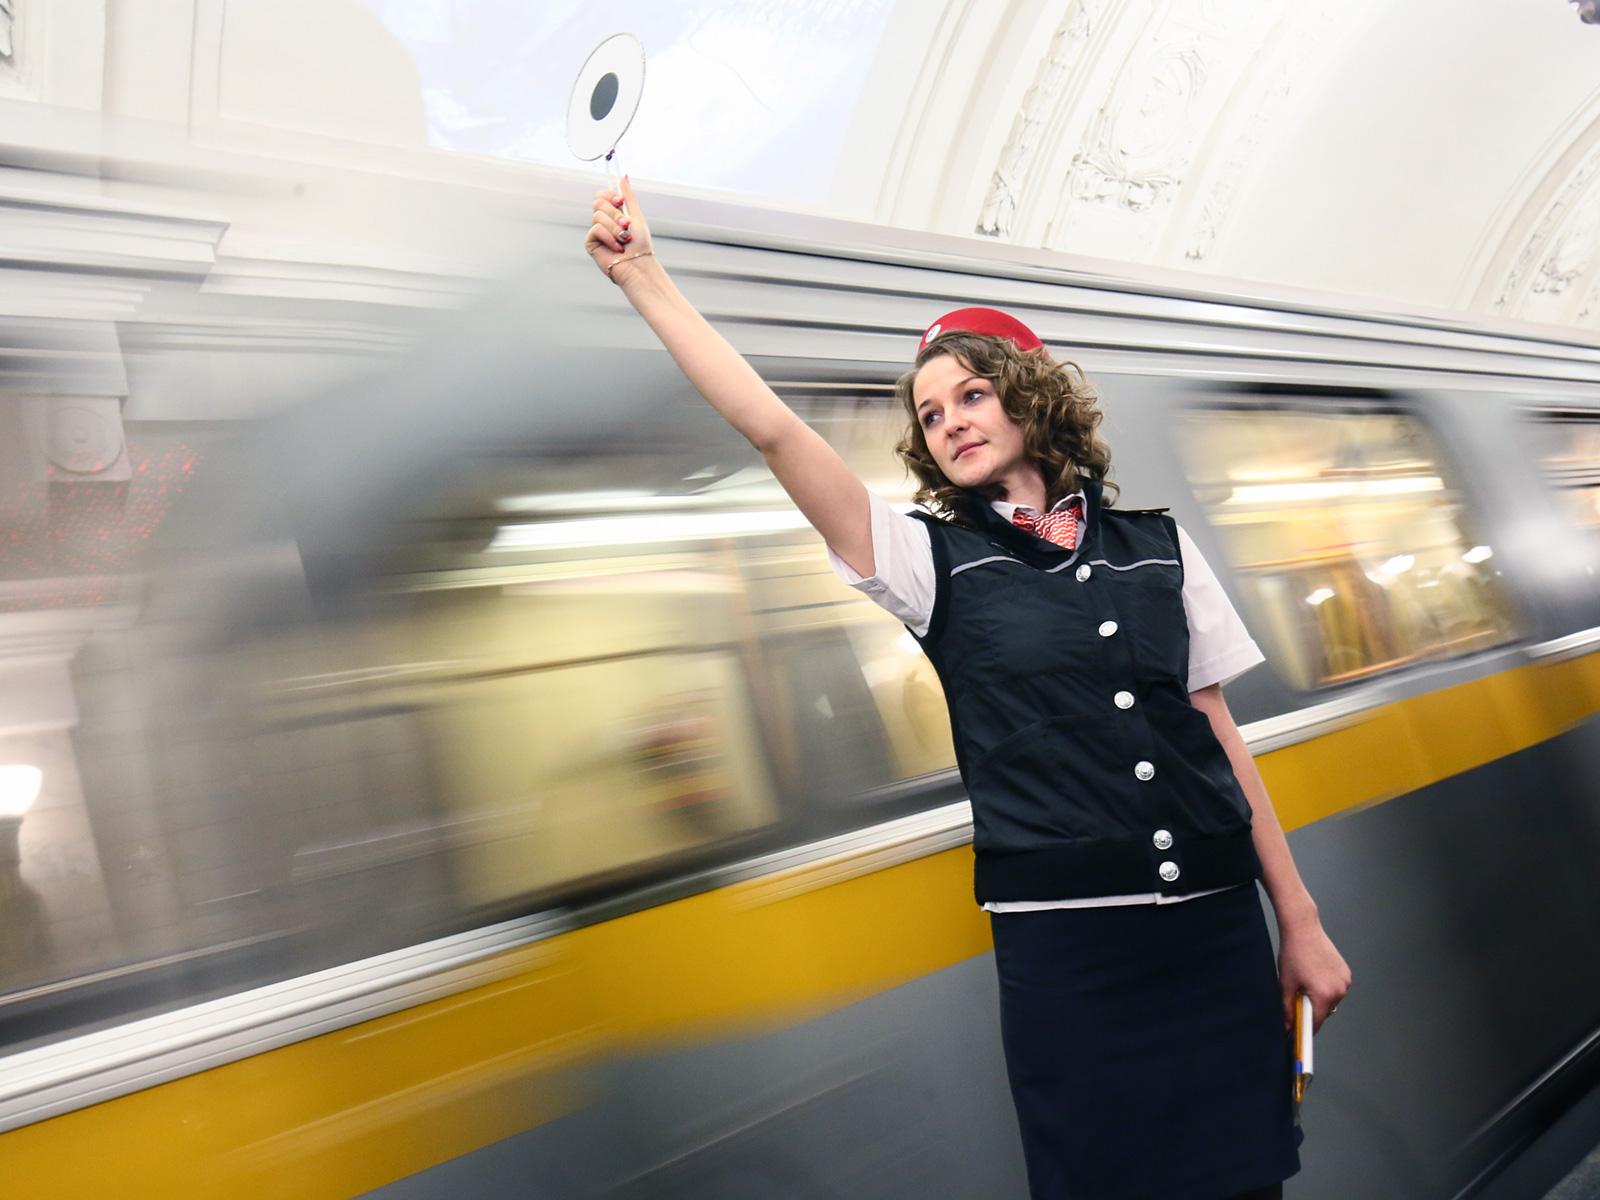 МКБ предлагает прокатиться в метро за 1 рубль - новости Афанасий